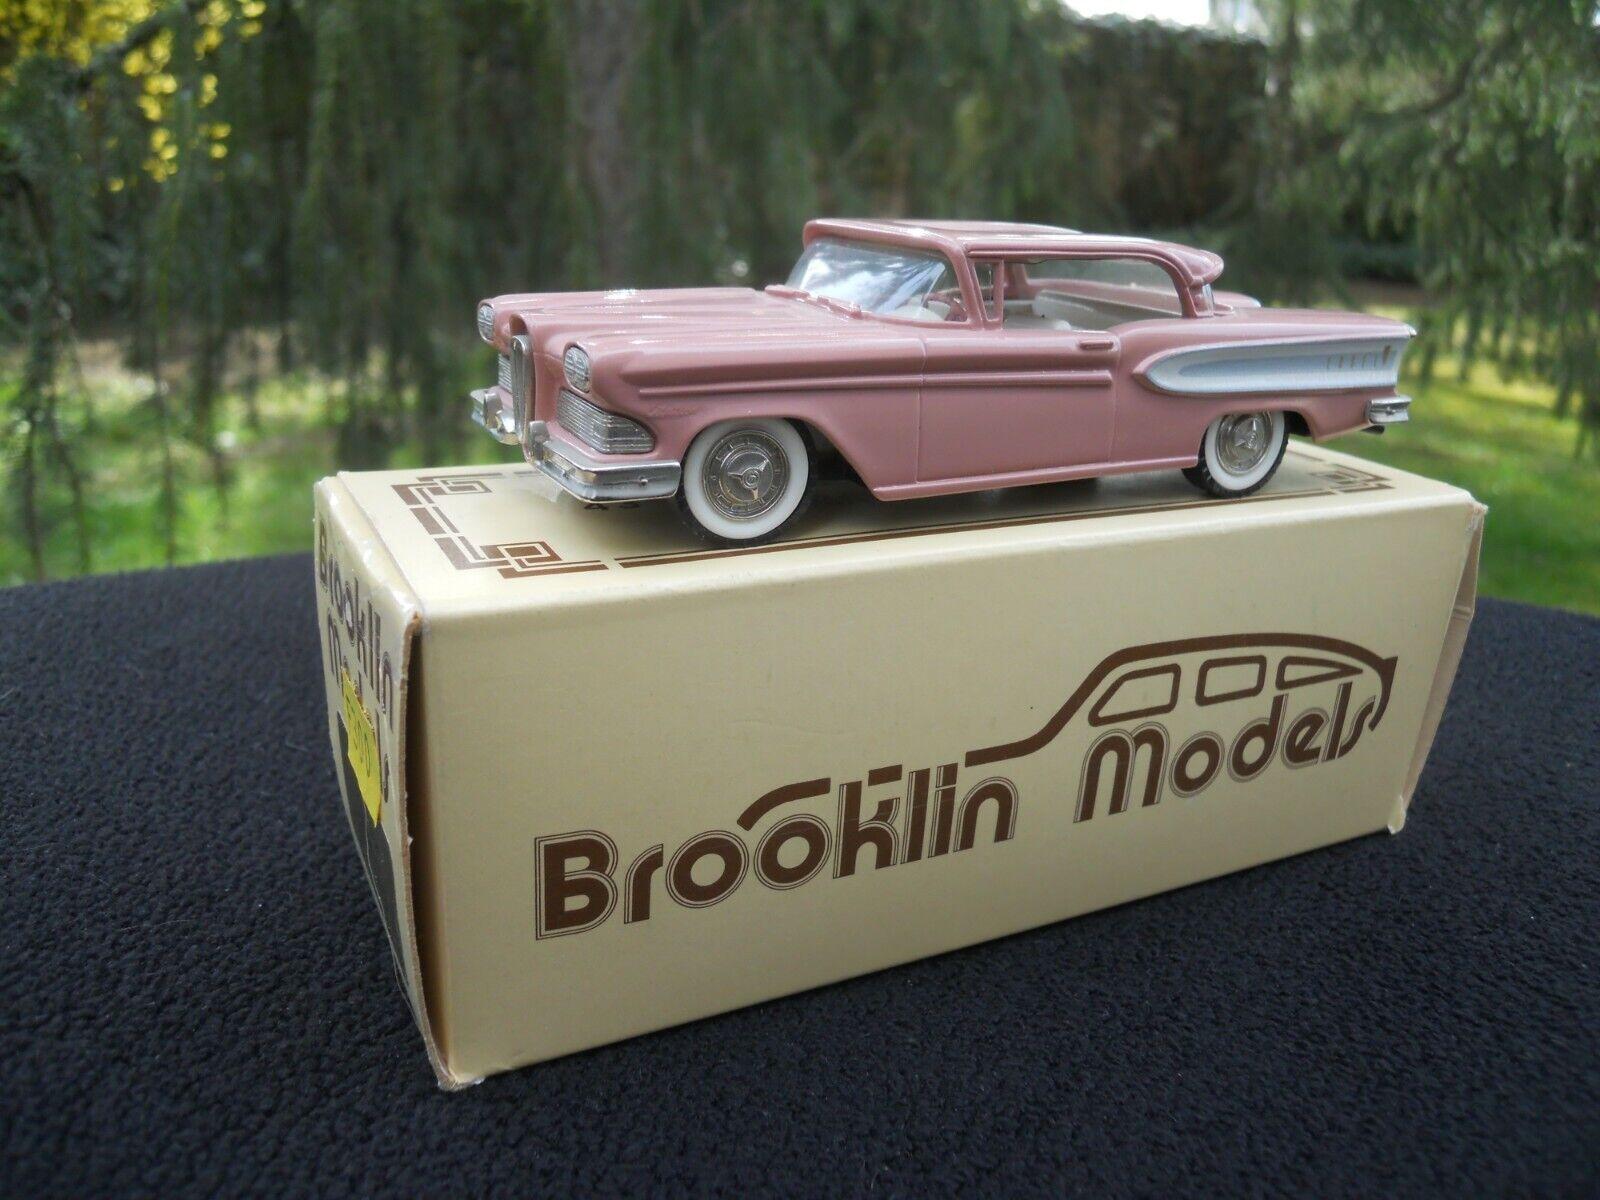 BROOKLIN MODELS 22 EDSEL CITATION TWO DOOR HARDTOP